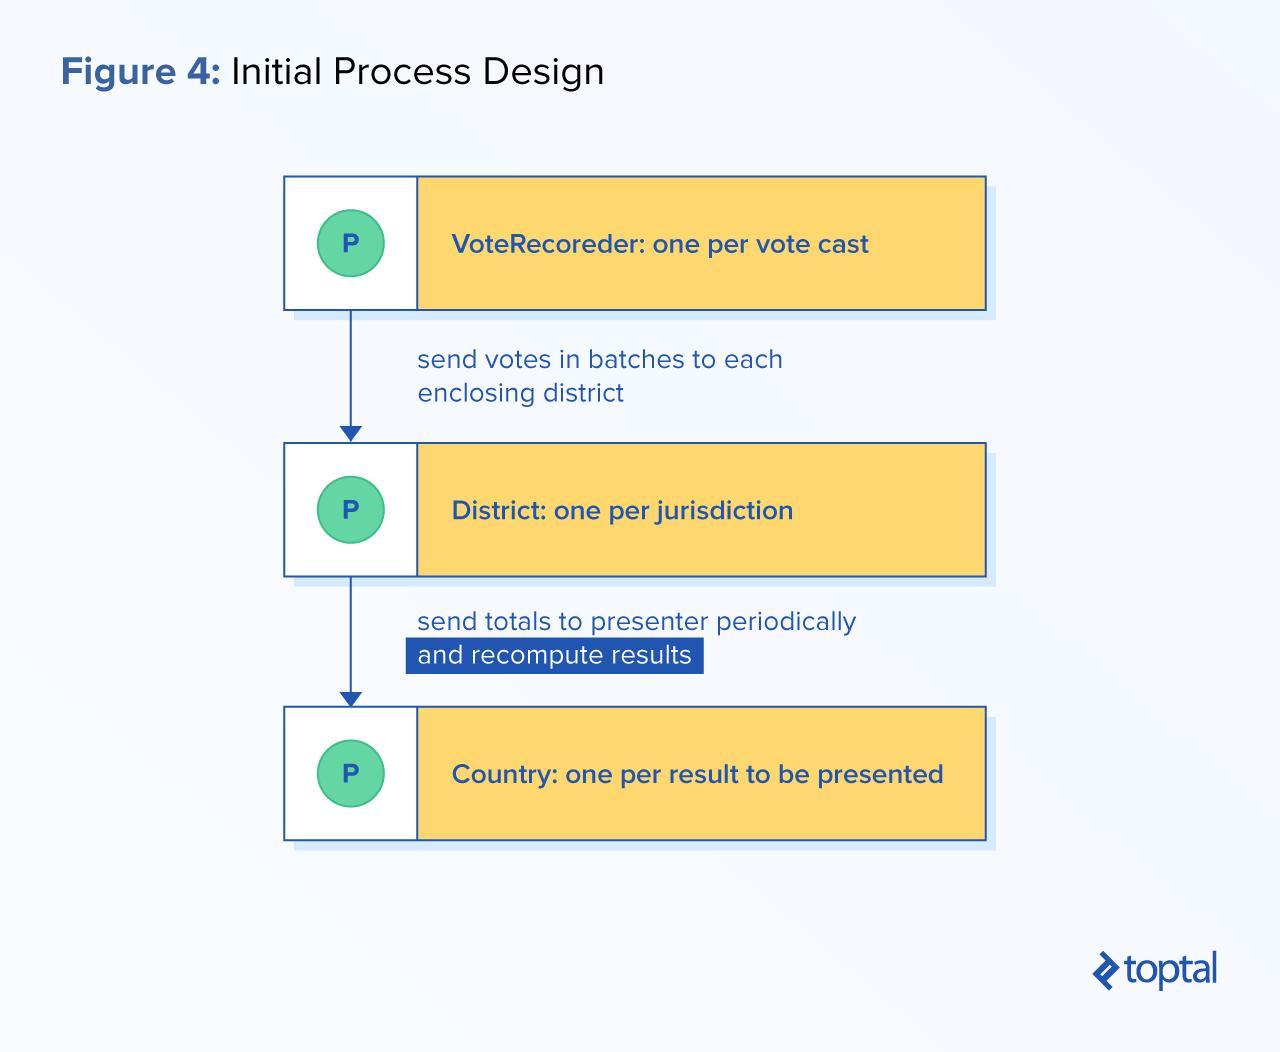 Process-oriented development example: Initial process design